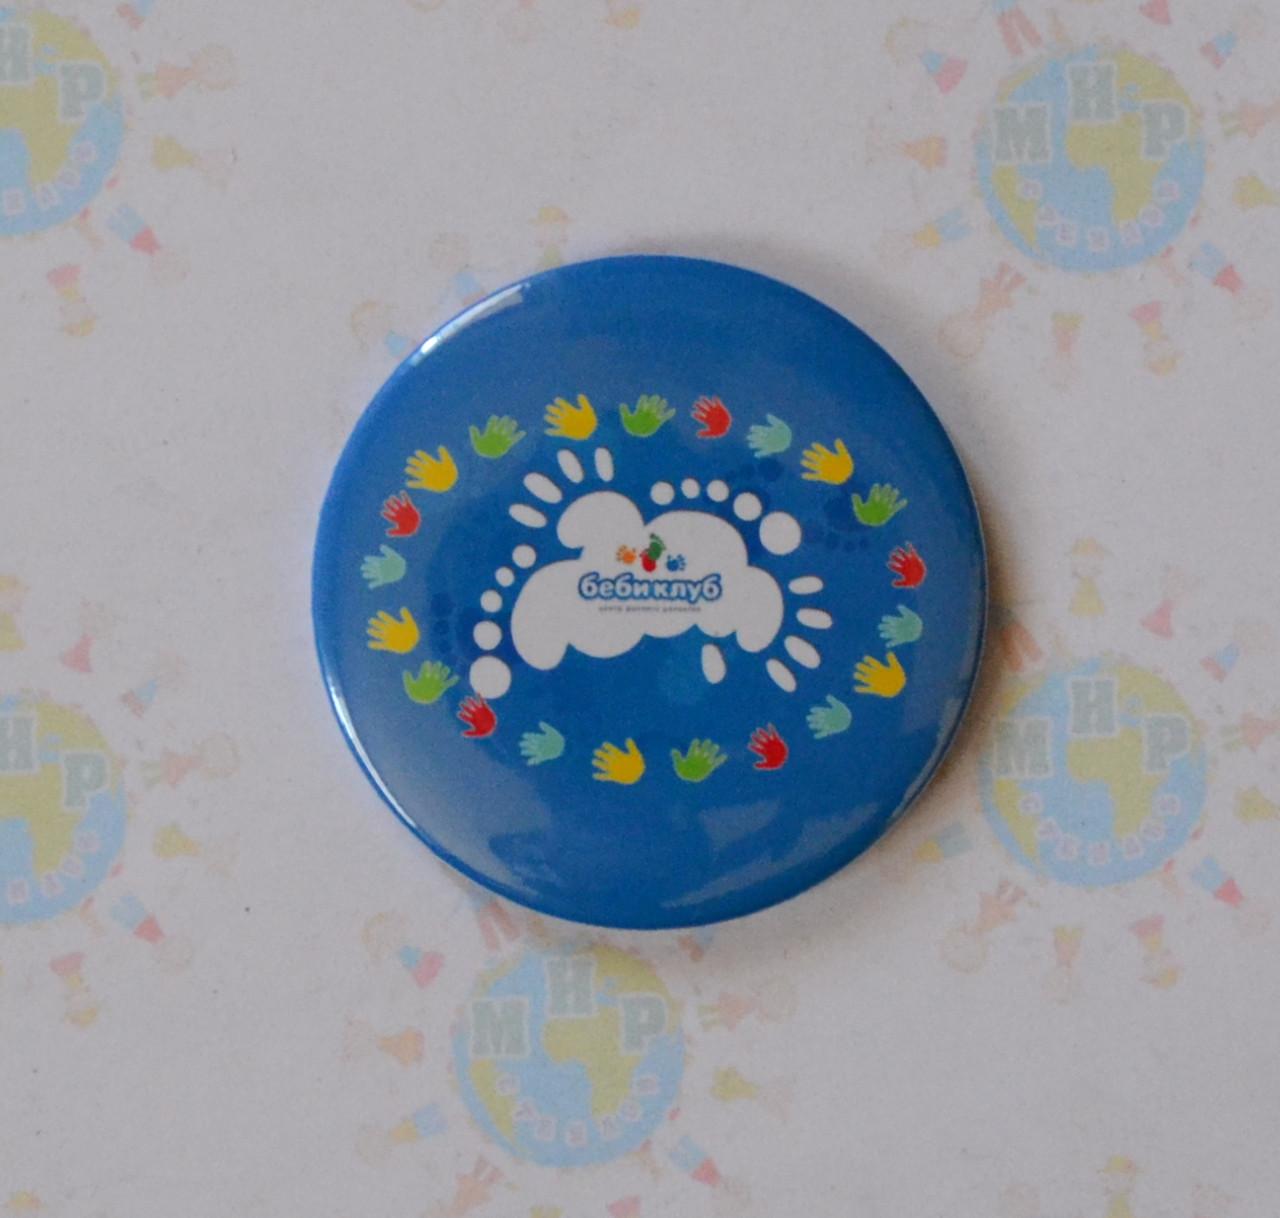 Значок с логотипом детского клуба Бебиклуб